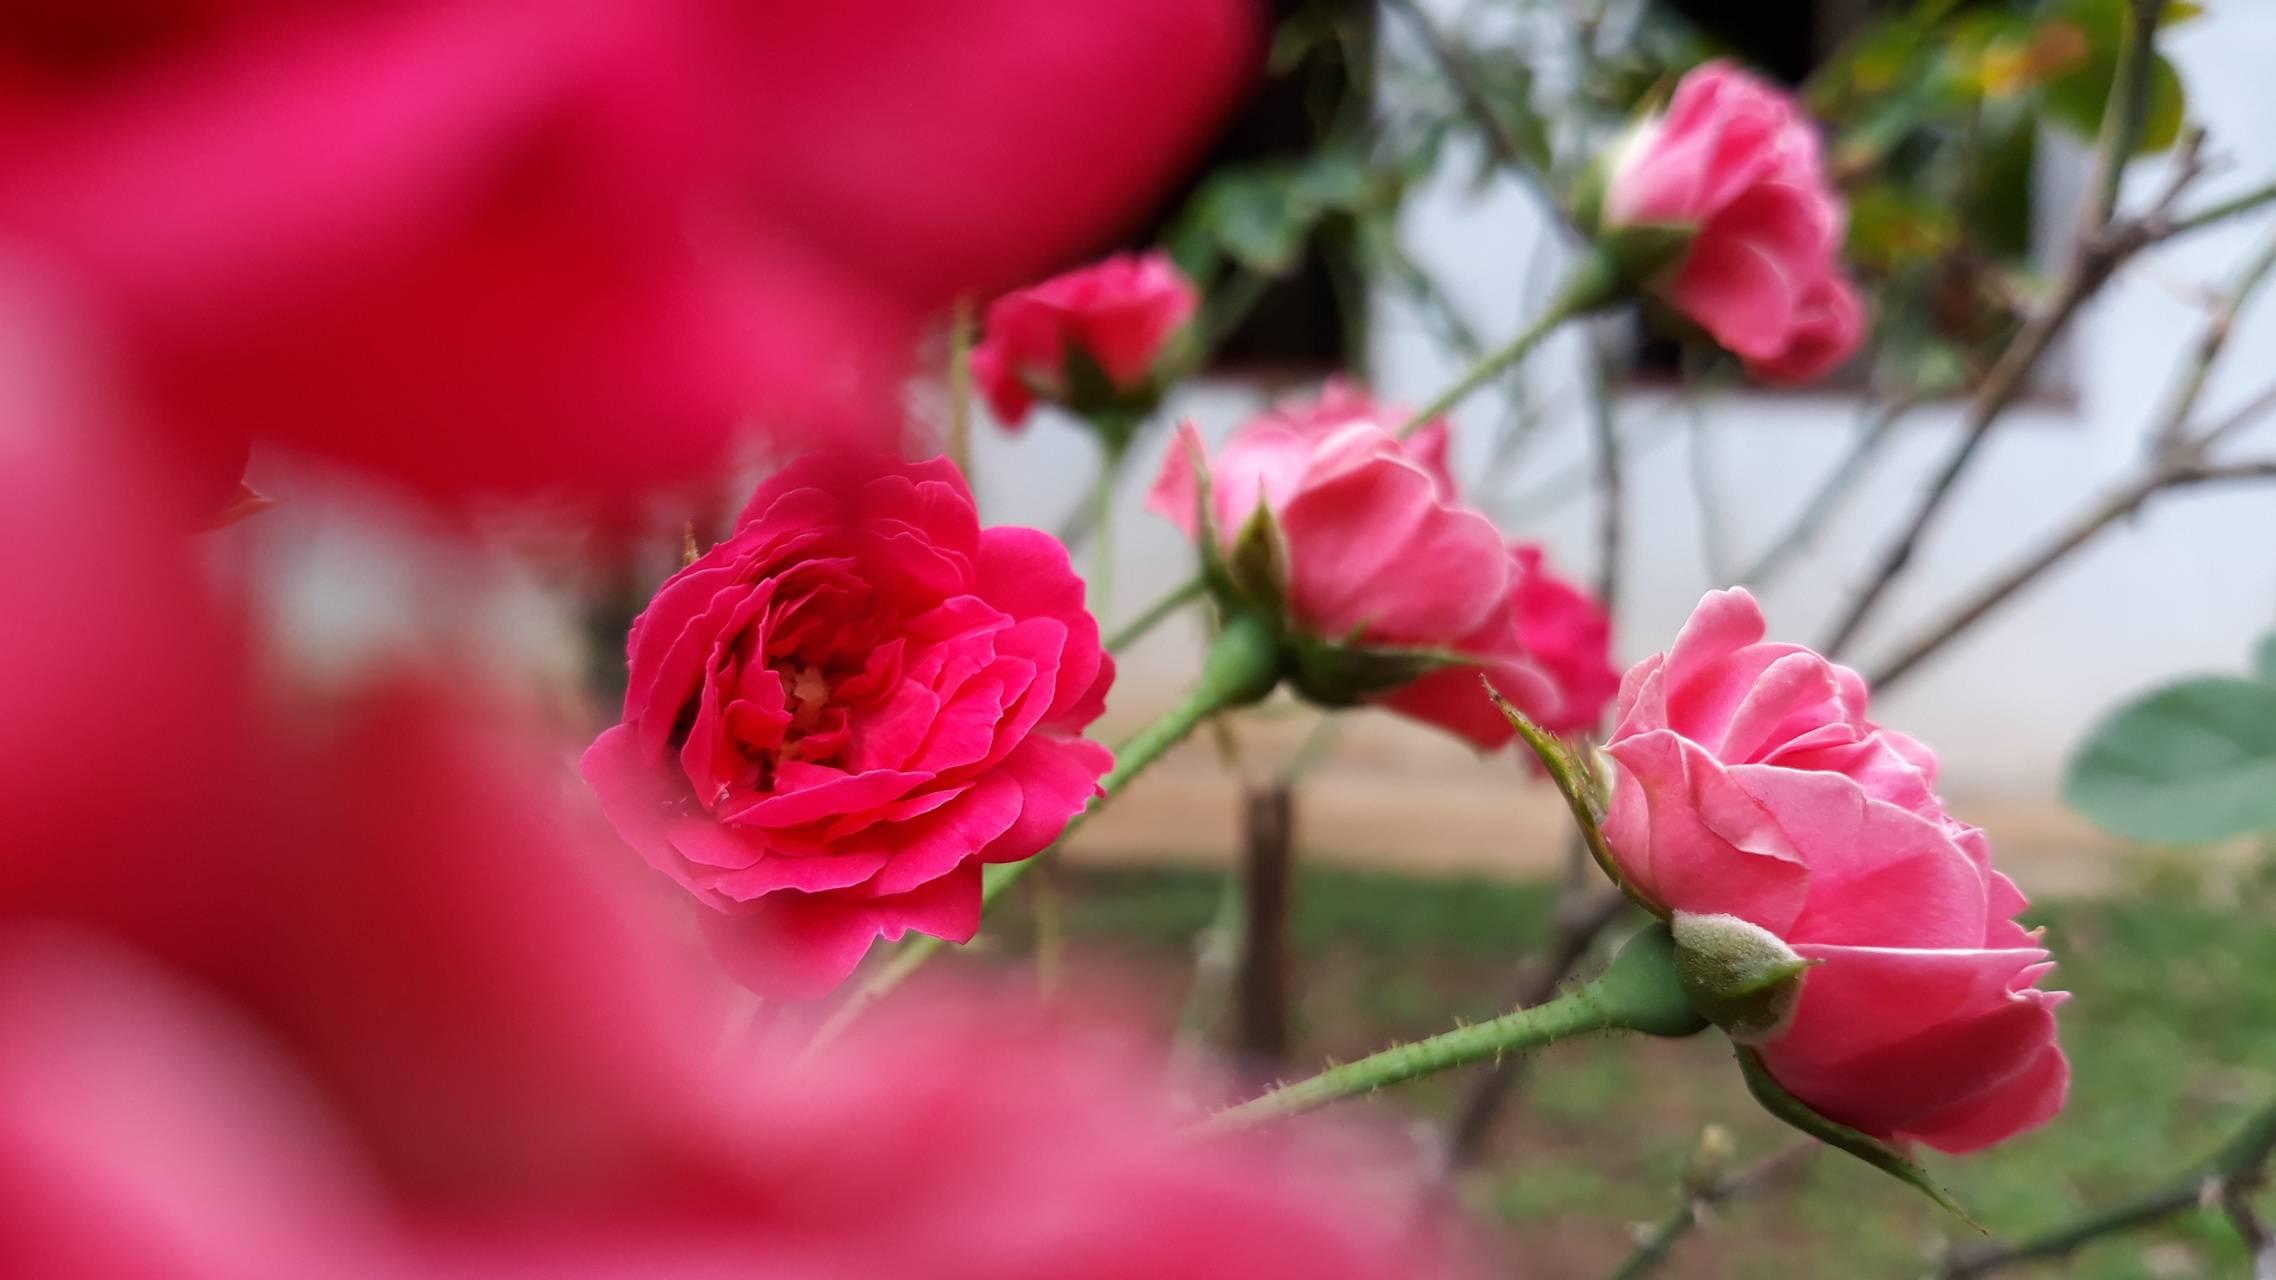 BG Rose Flowers